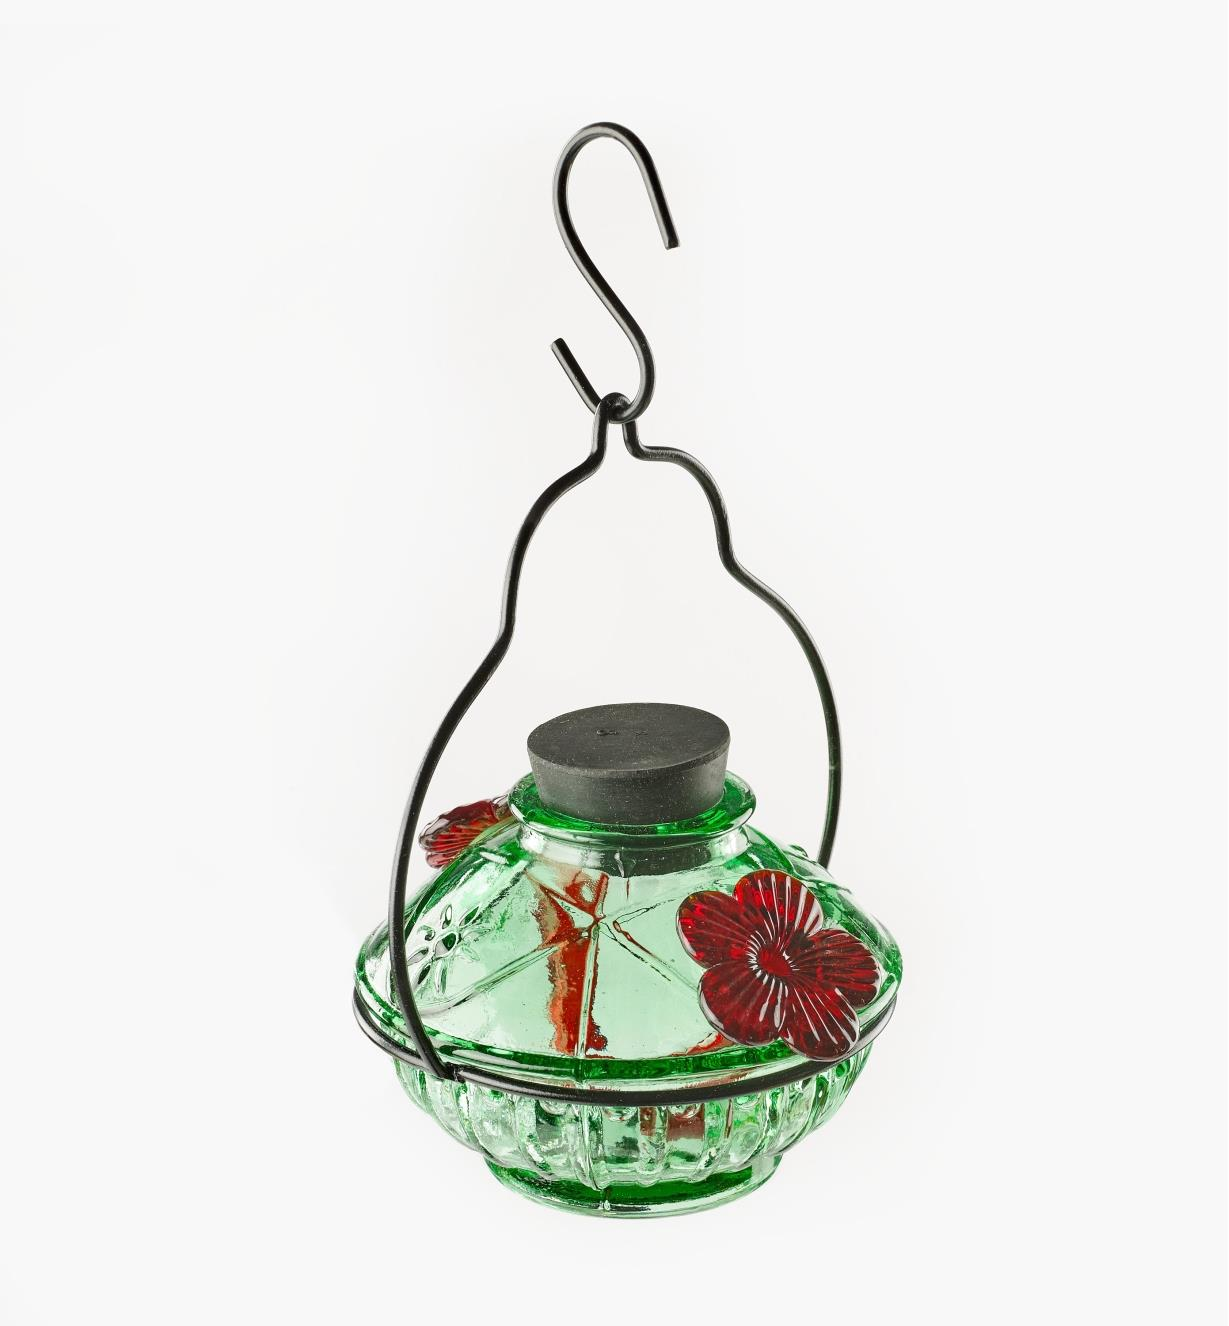 AG192 - Glass Hummingbird Feeder